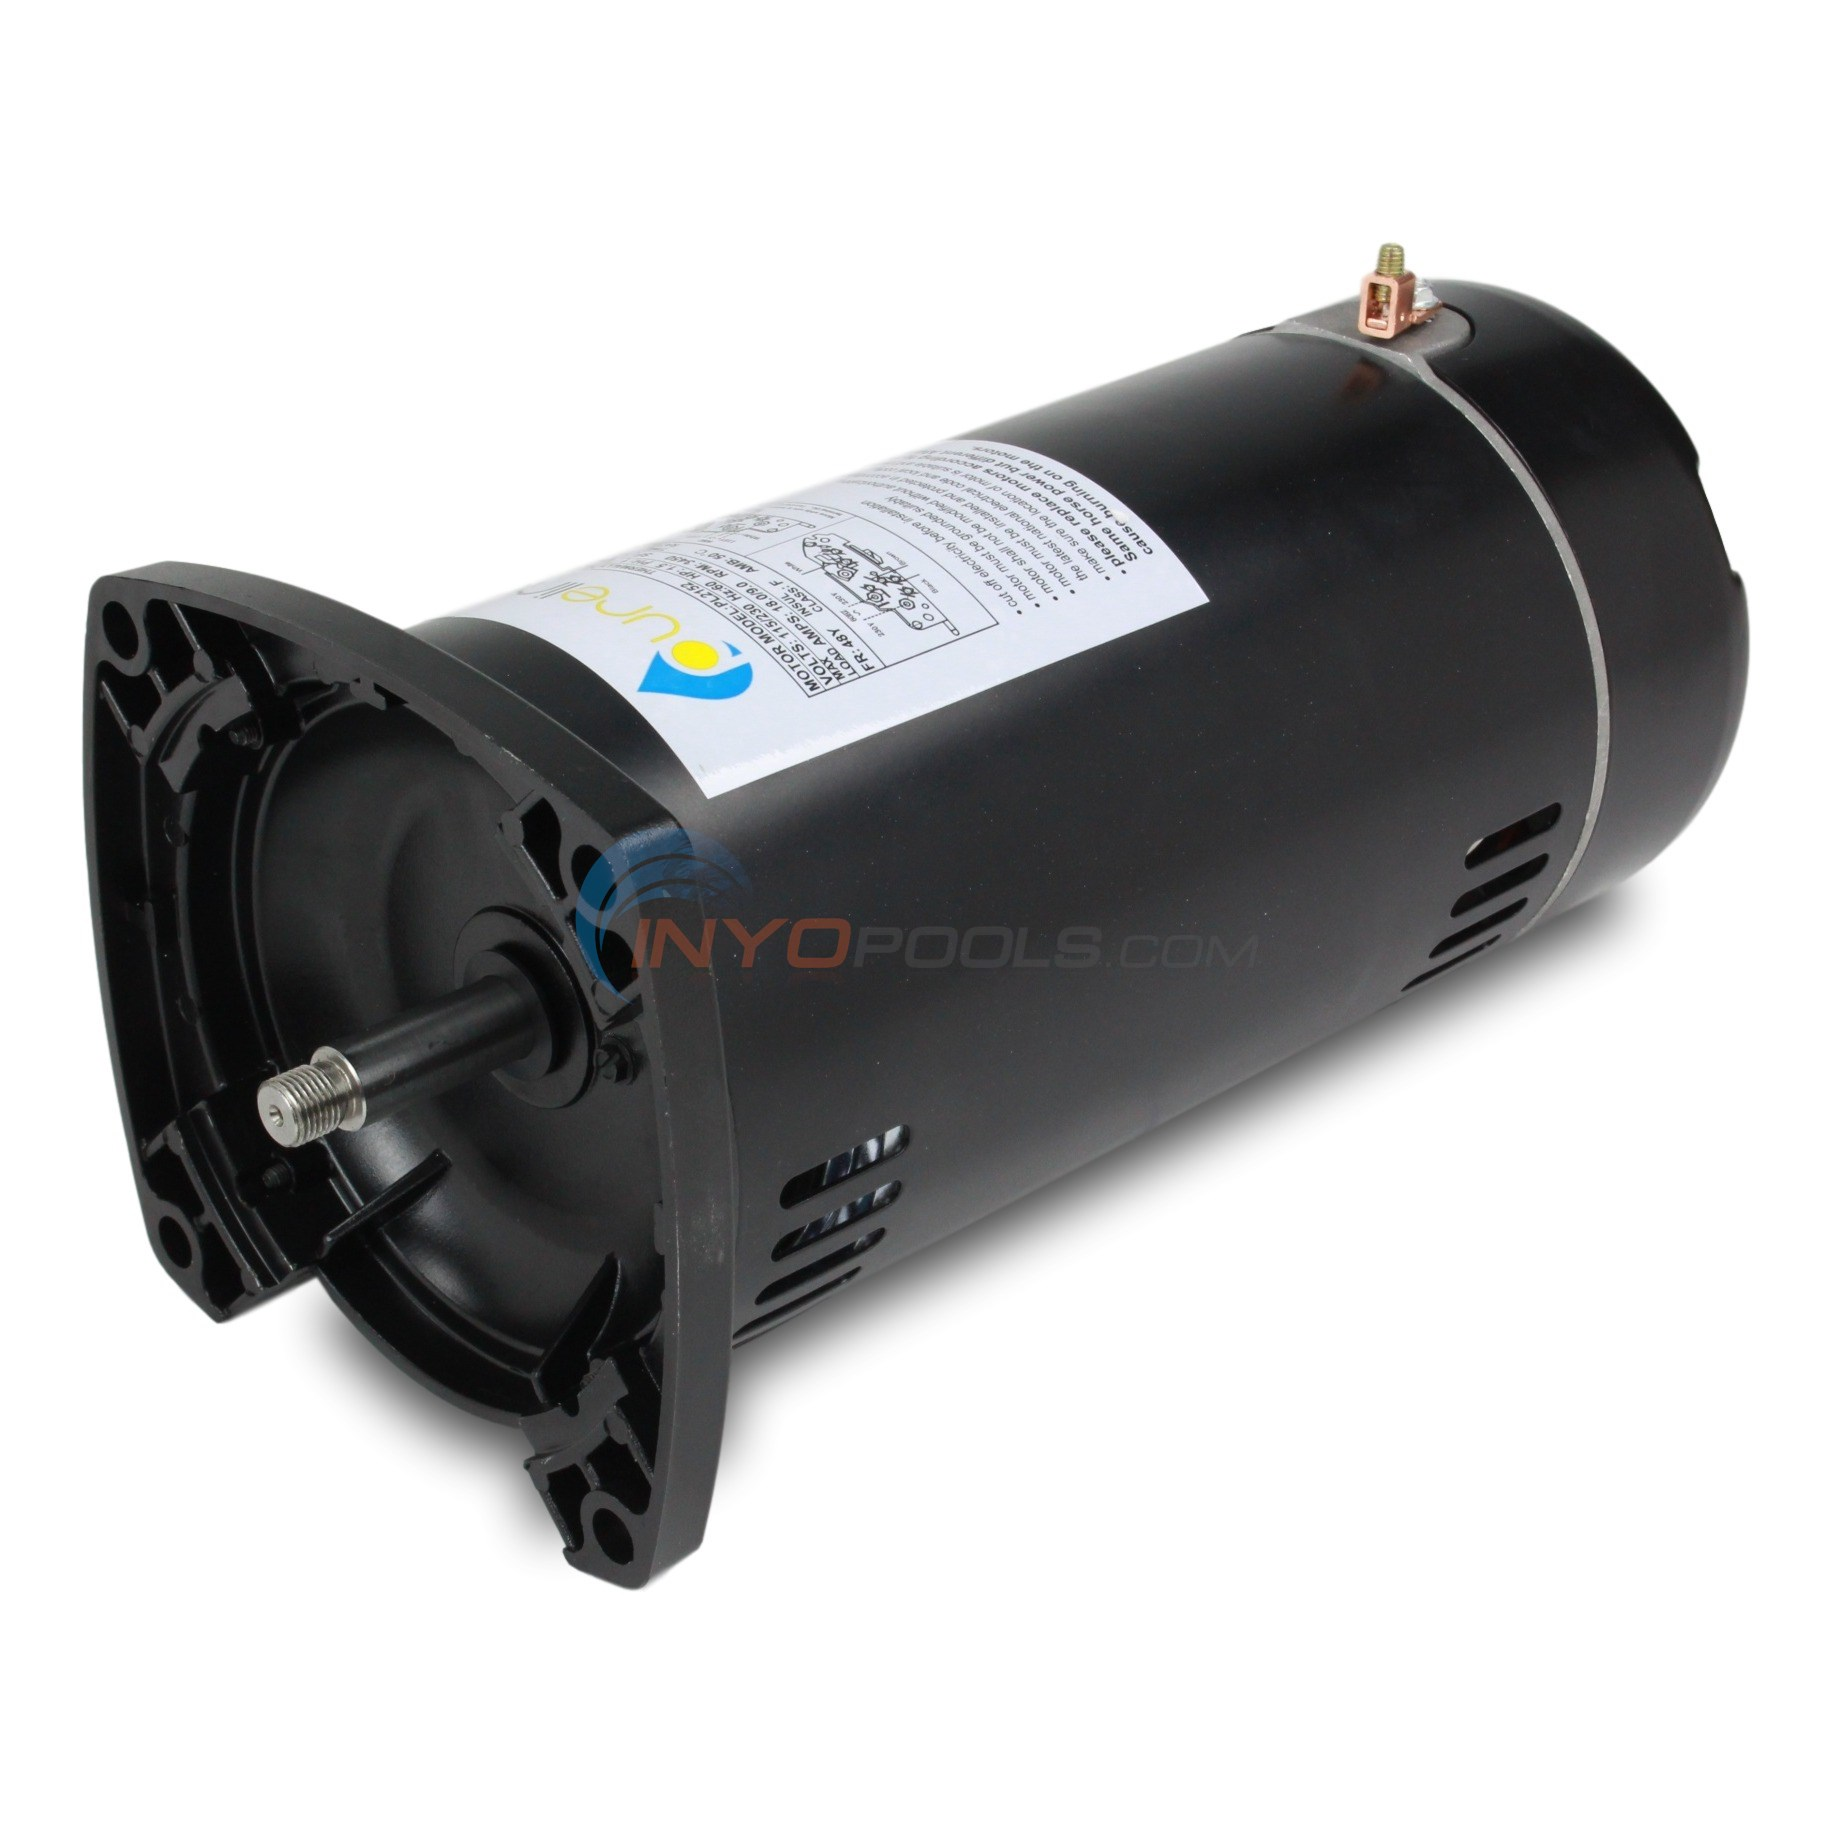 C48k2pa105c5 Century Motor Wiring Diagram Reinvent Your Magnetek Pureline 1 Hp Pool Square Flange 48y Pl2102 Inyopools Com Rh Single Phase Diagrams Old Electric